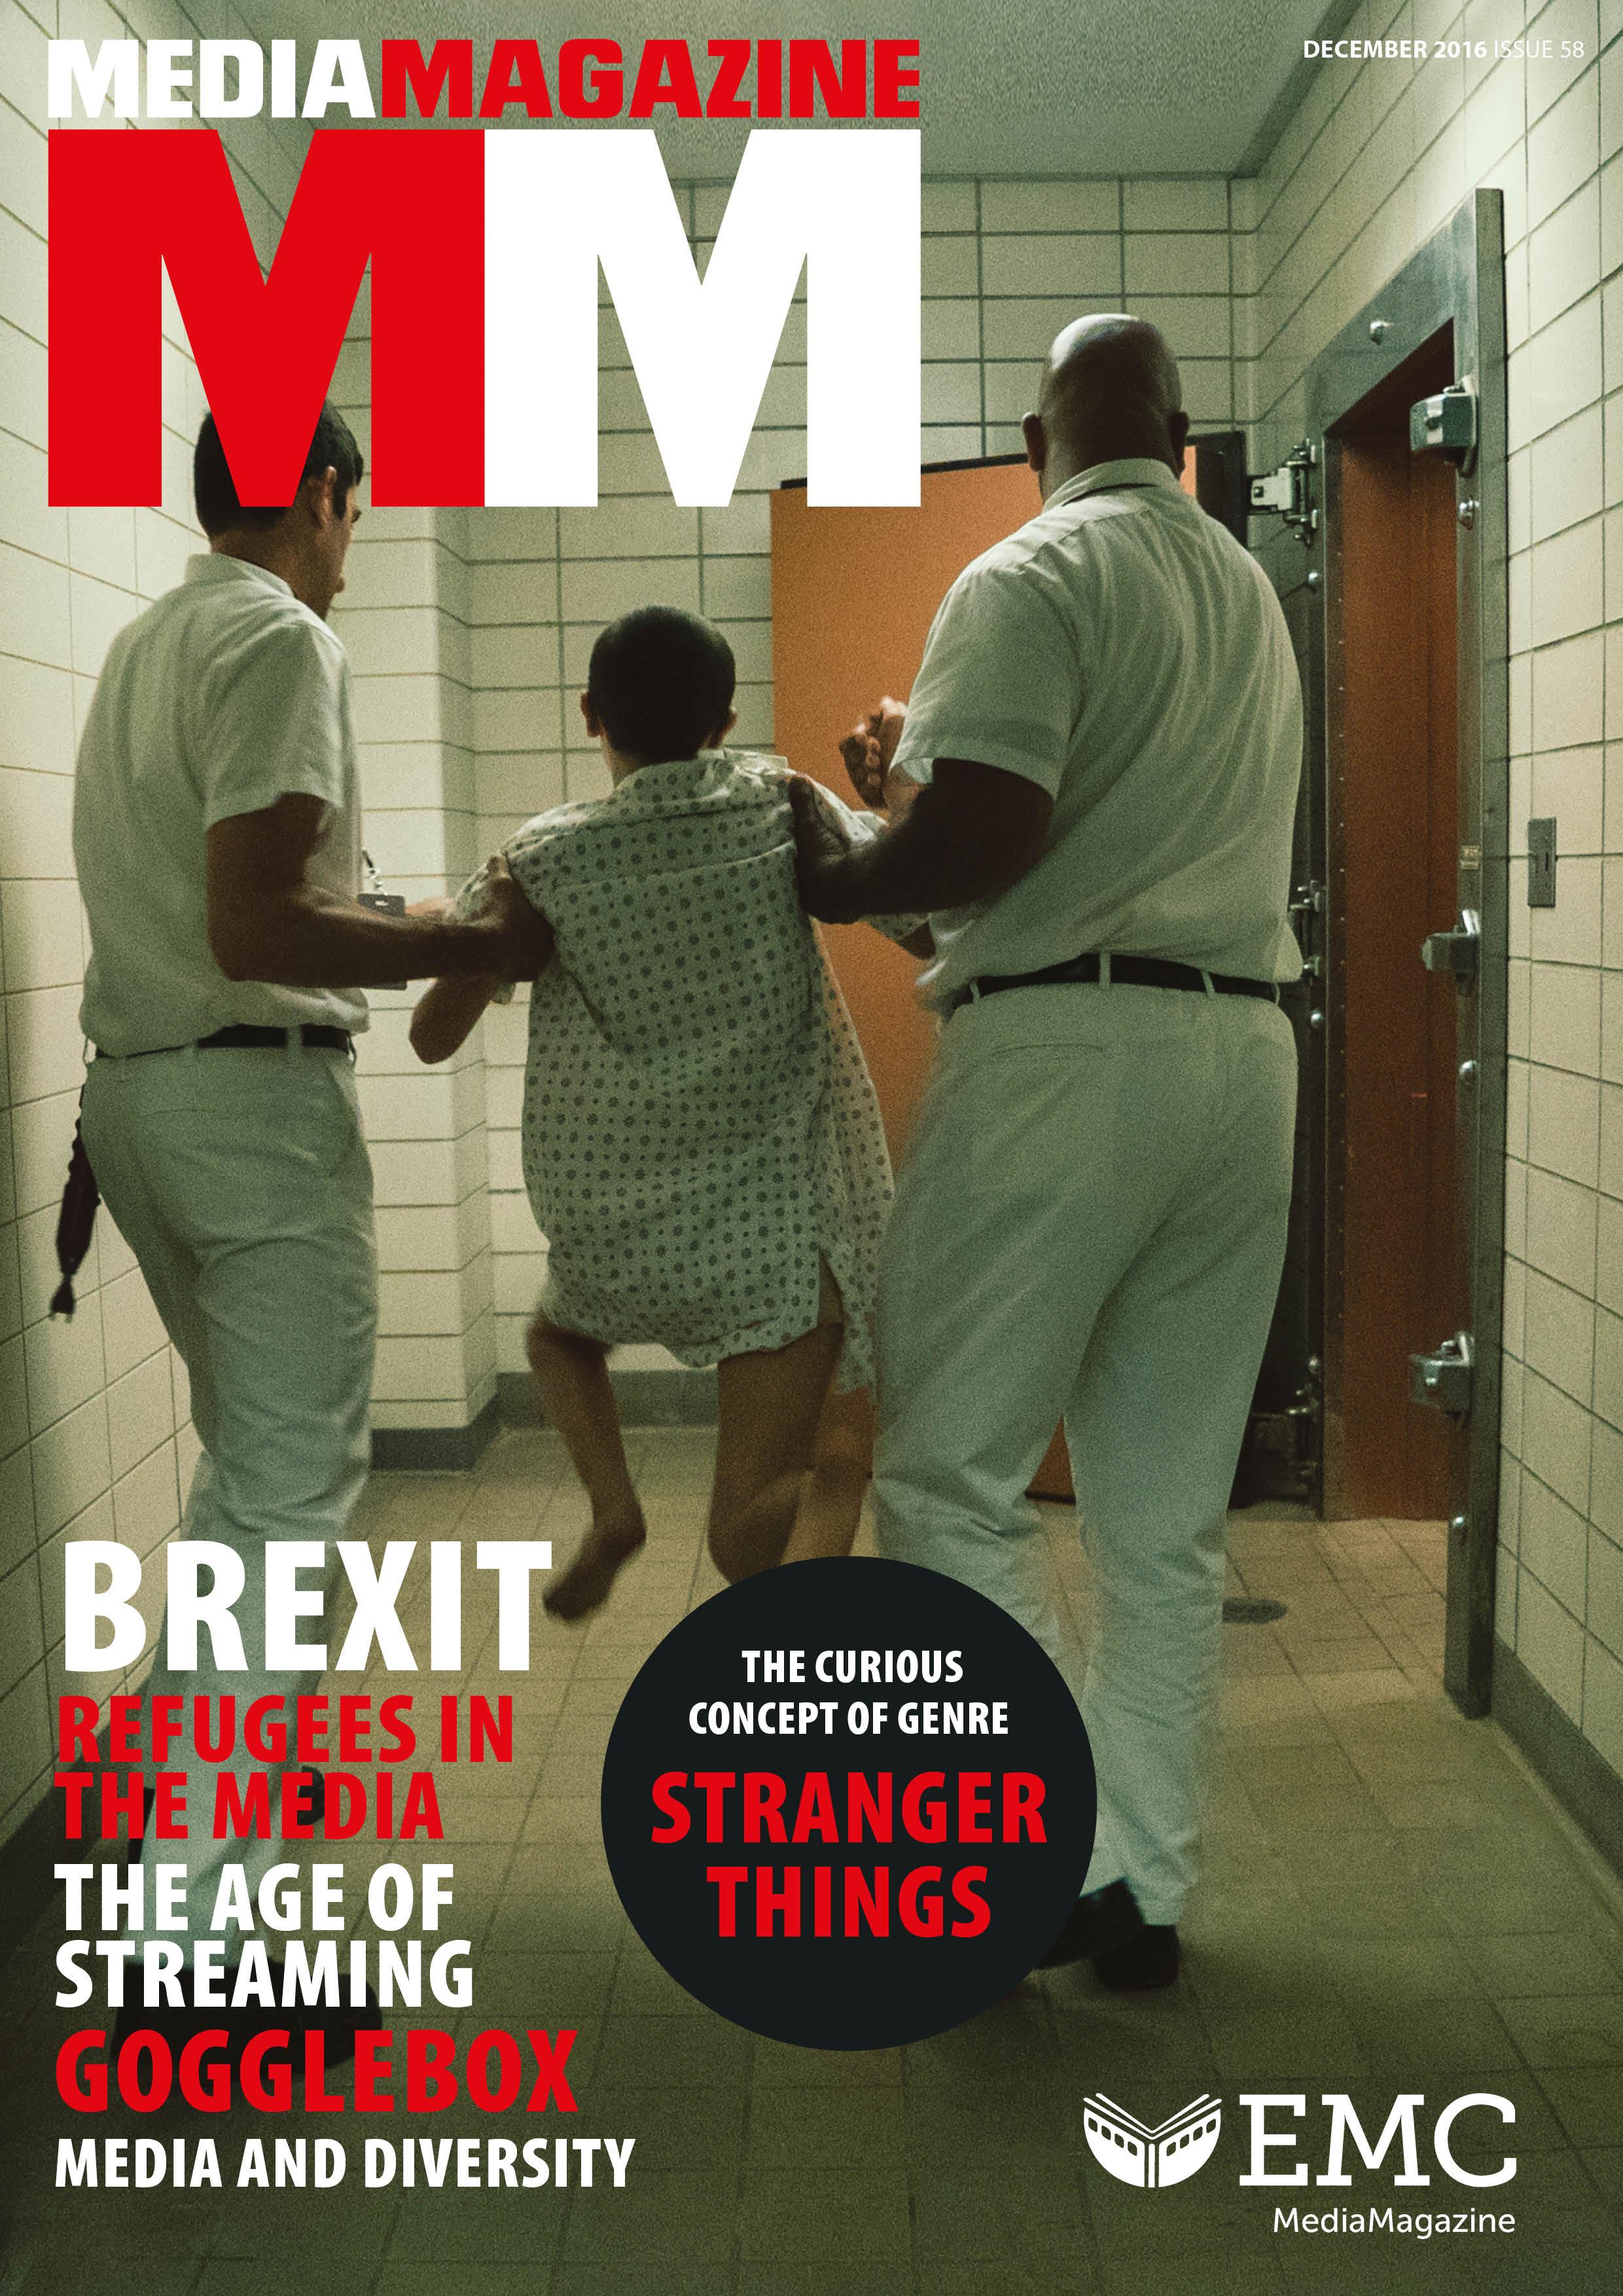 MediaMagazine 58 front cover